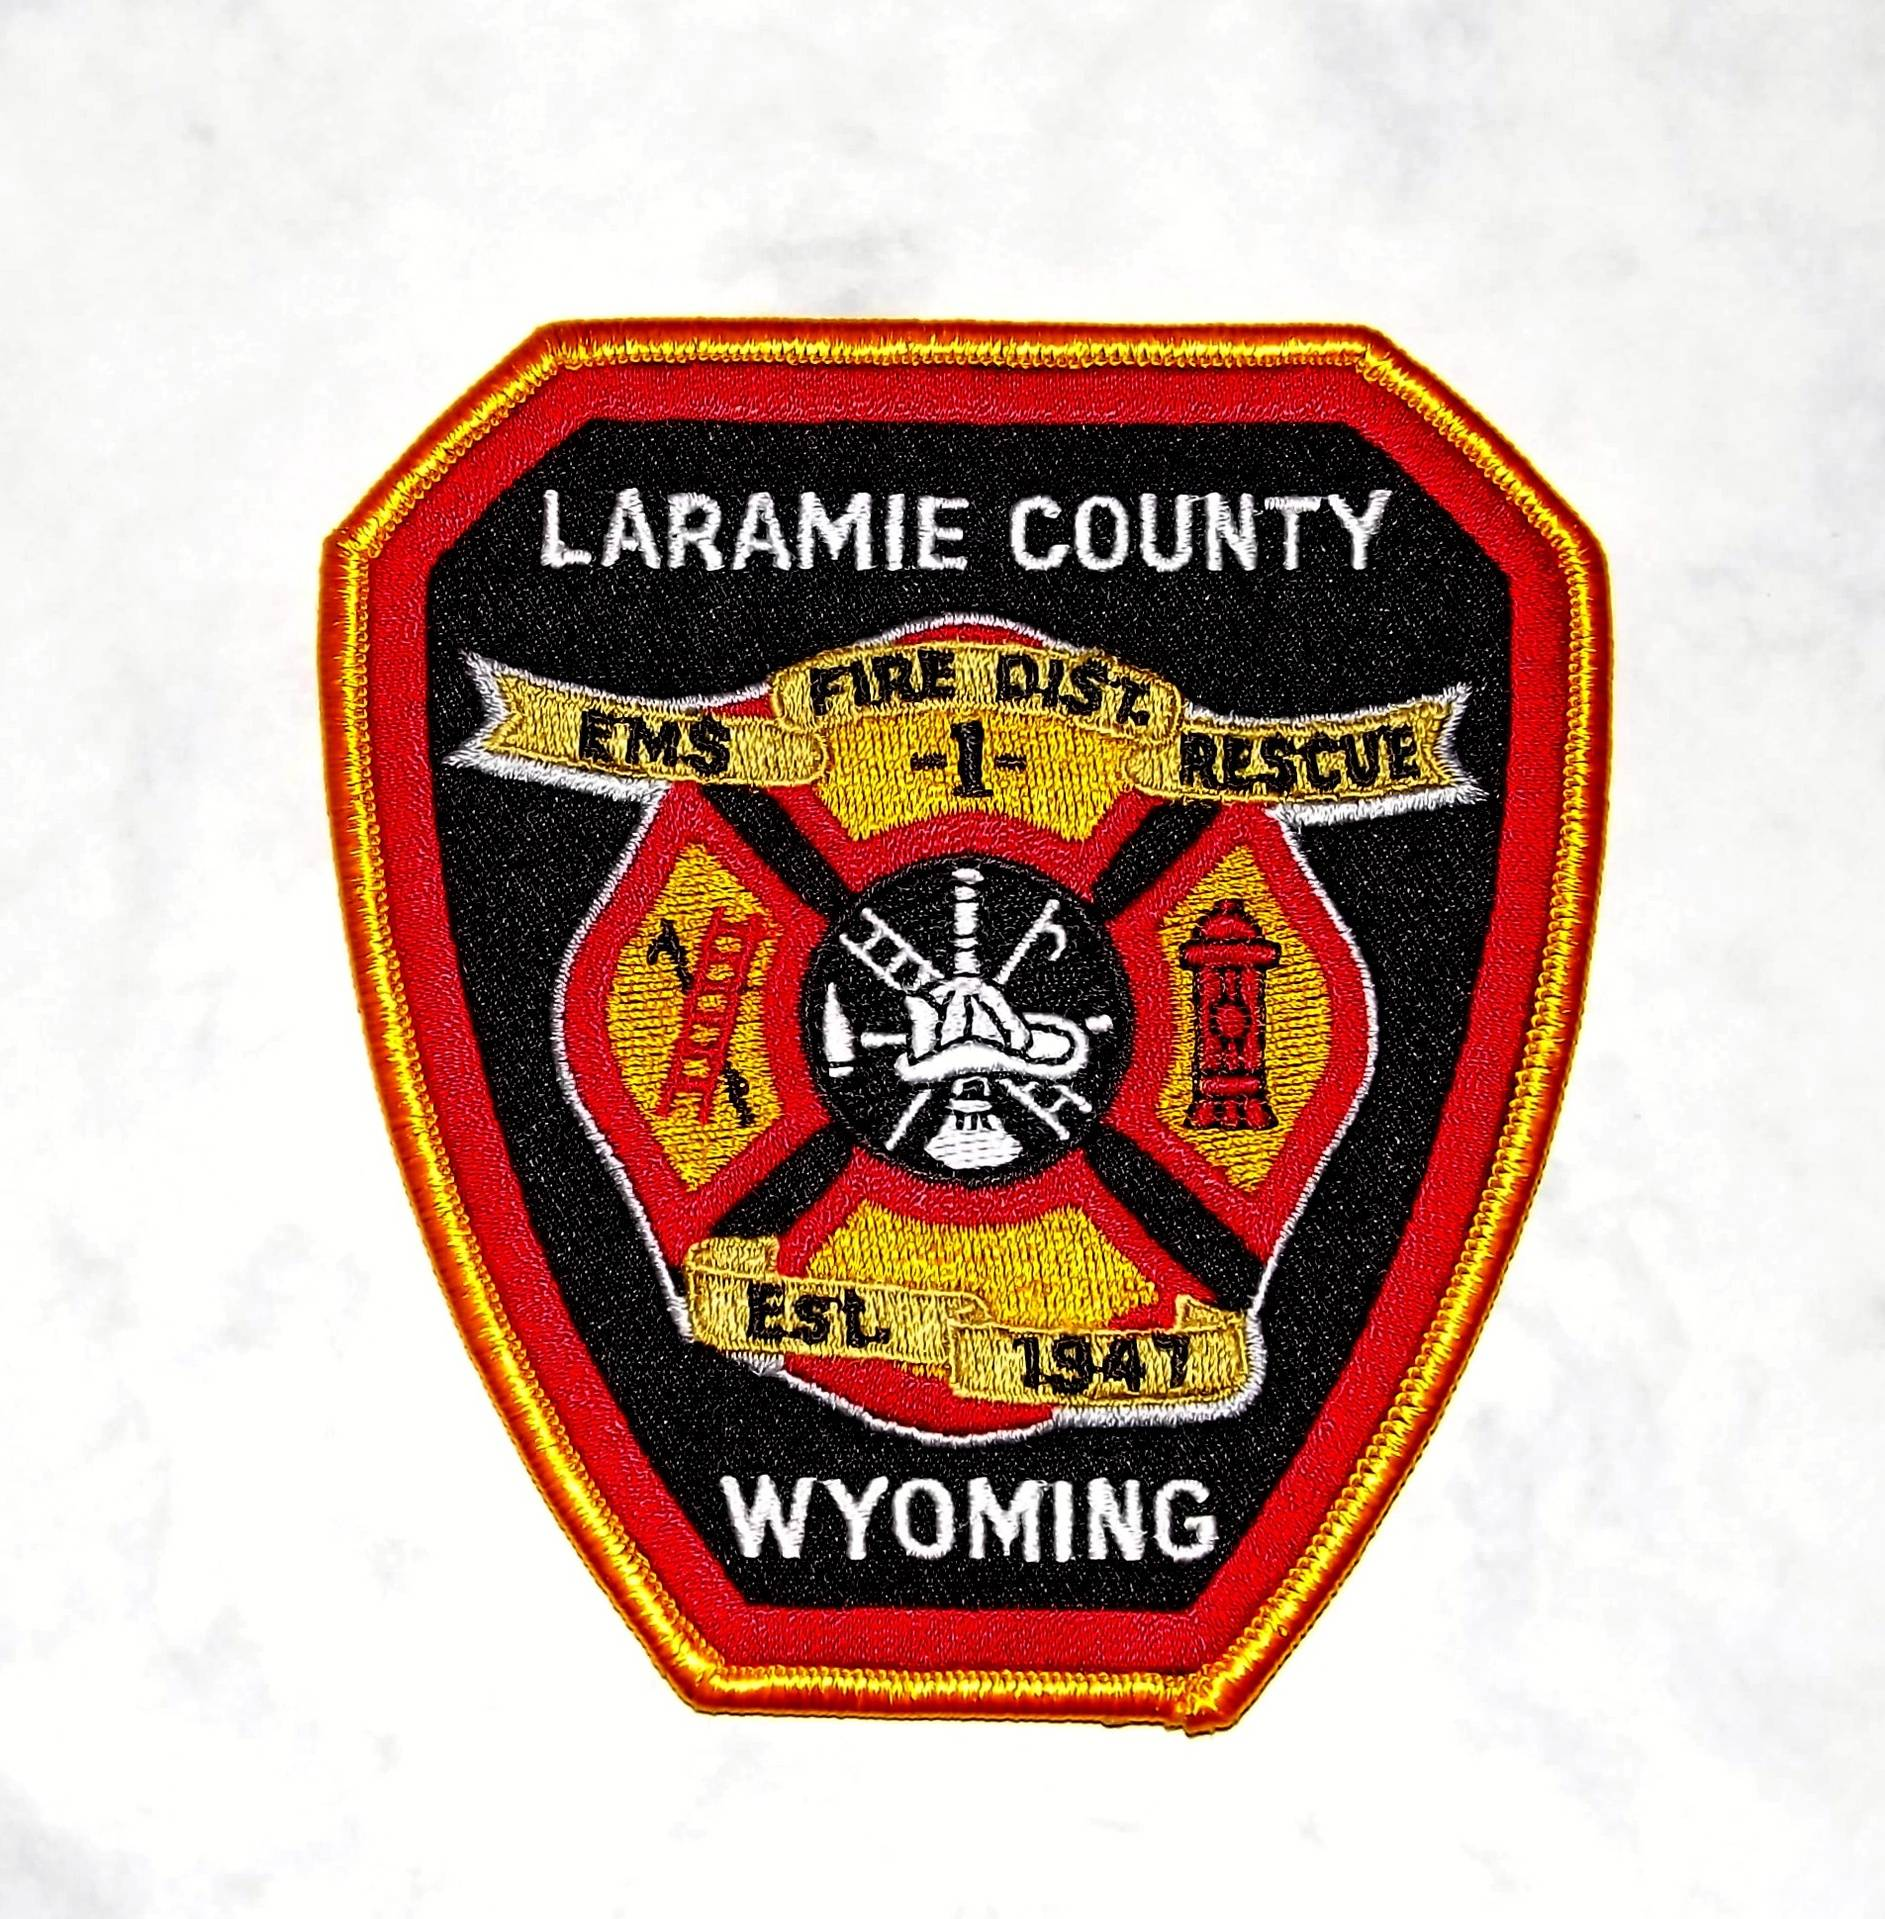 Laramie Co. Wyoming